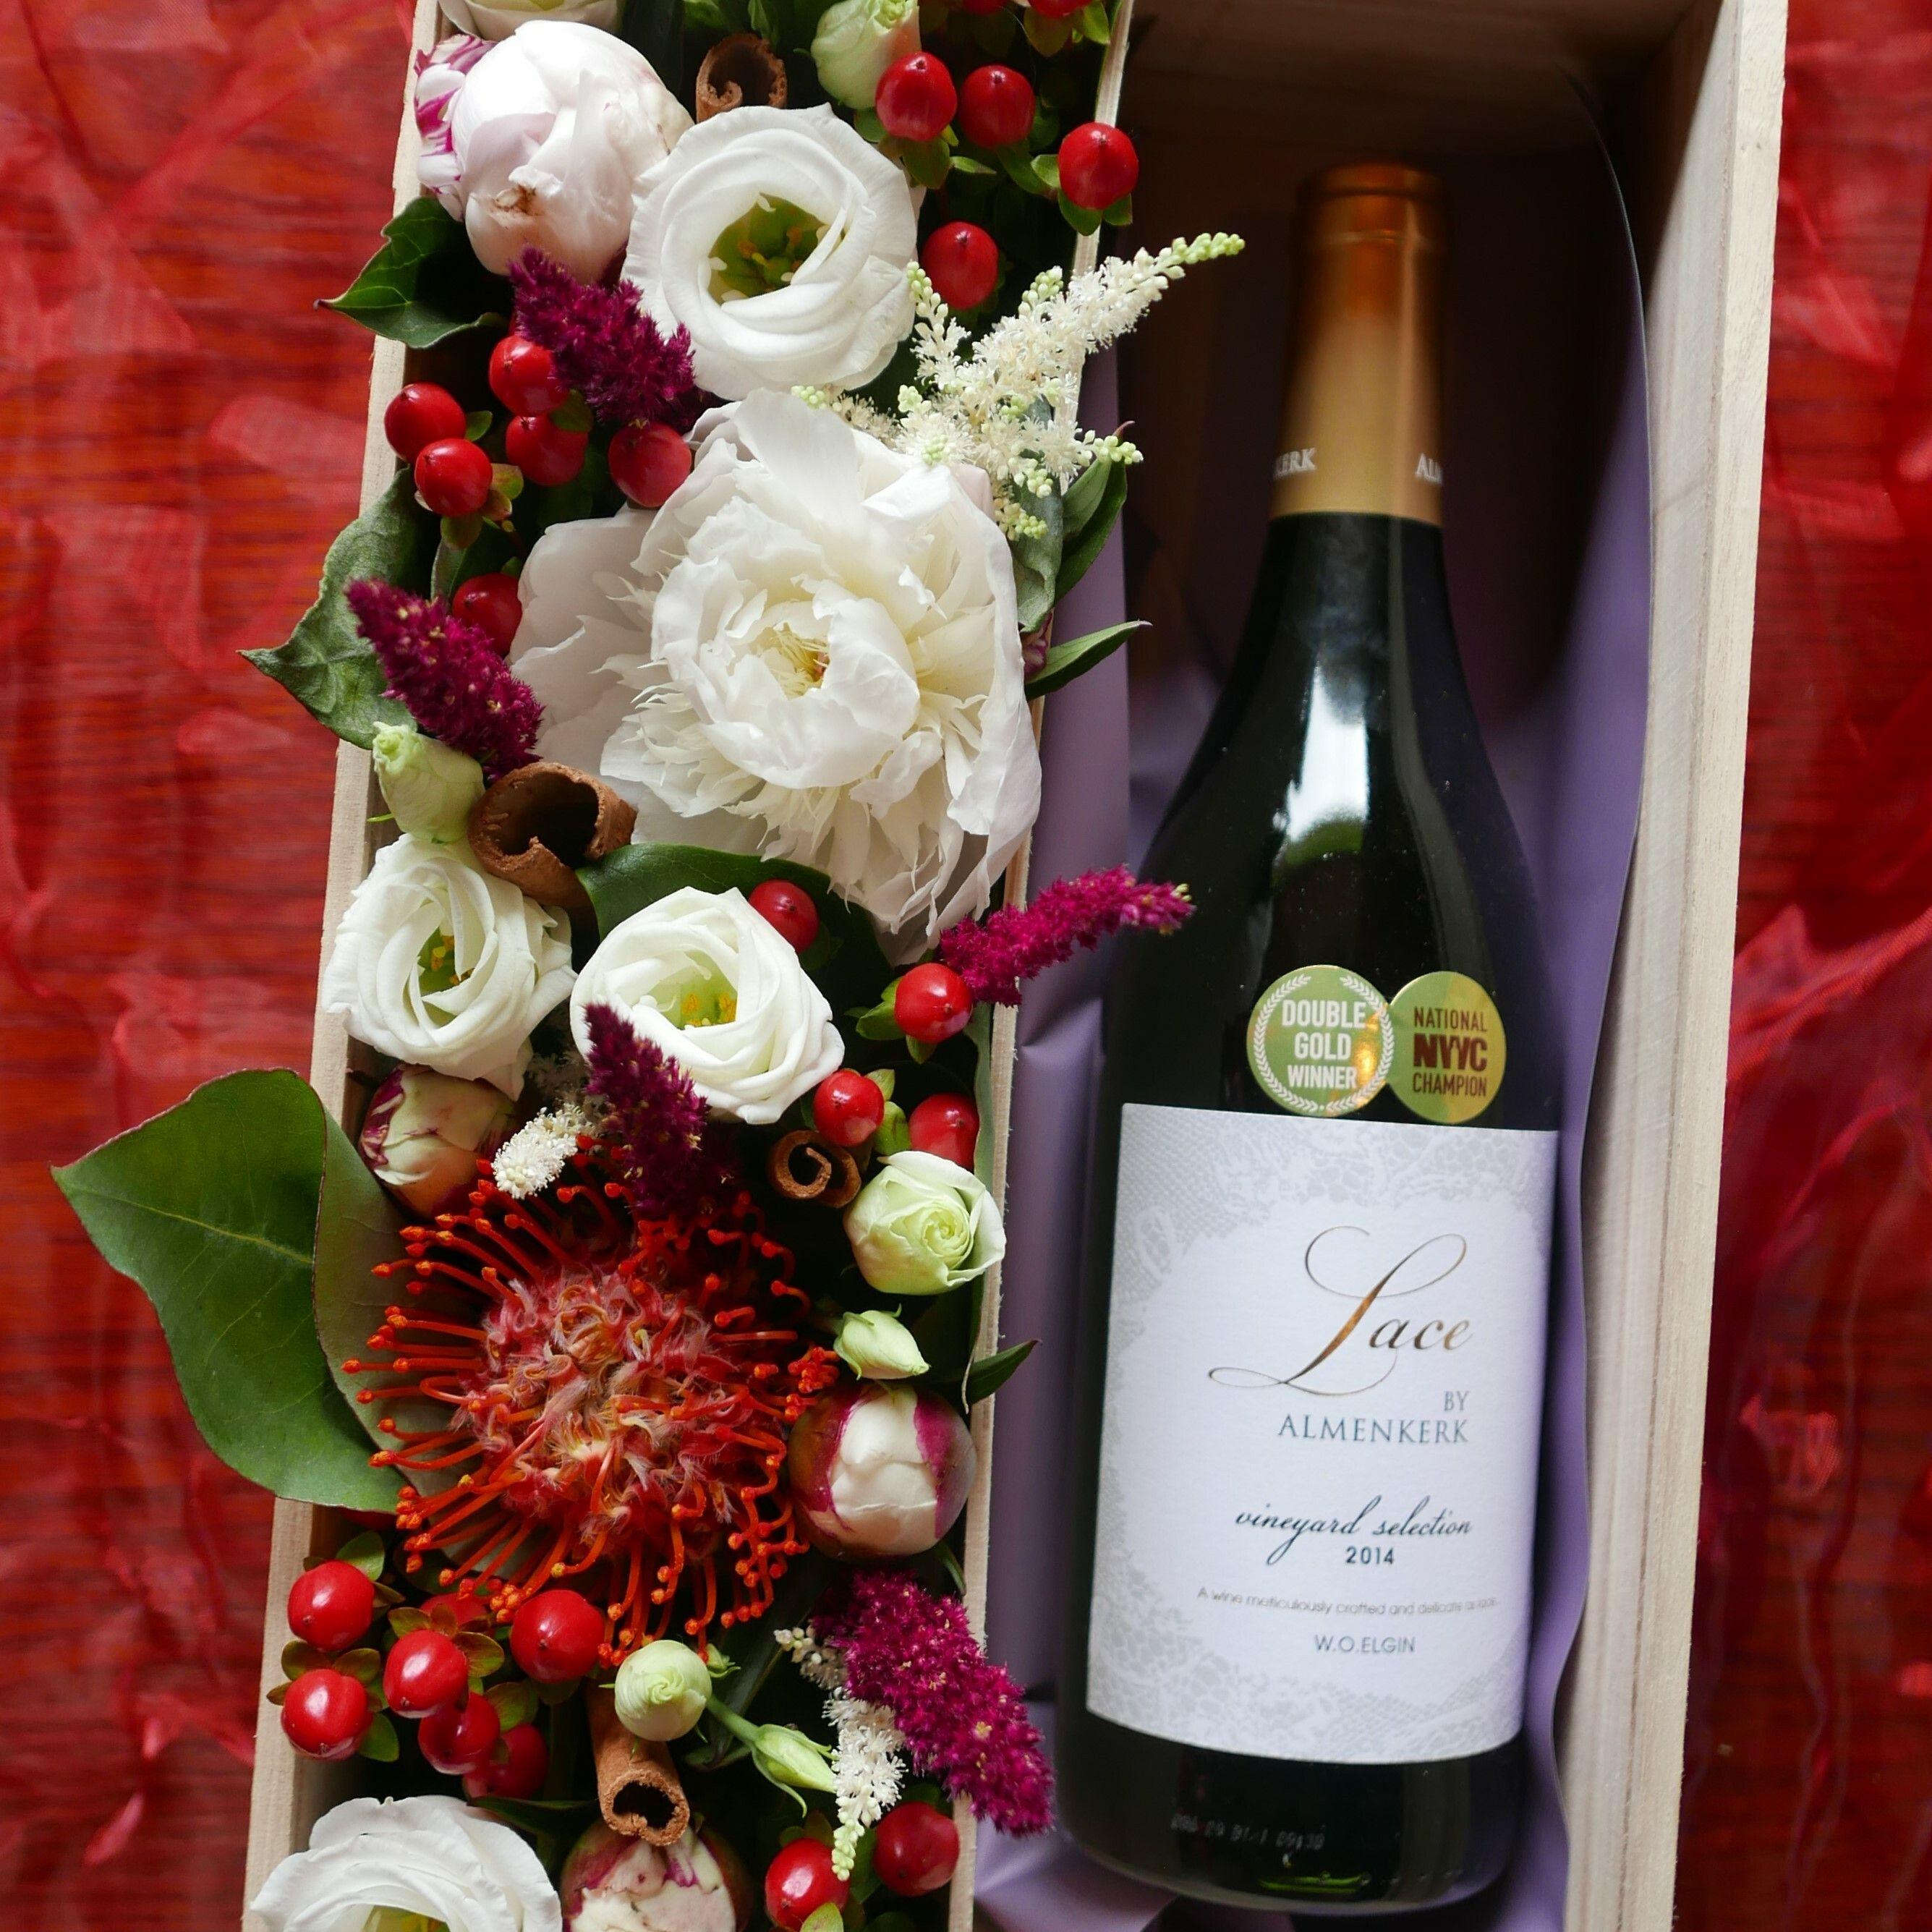 Almenkerk Lace Vineyard Blend In 2020 Wijn Cabernet Sauvignon Druif